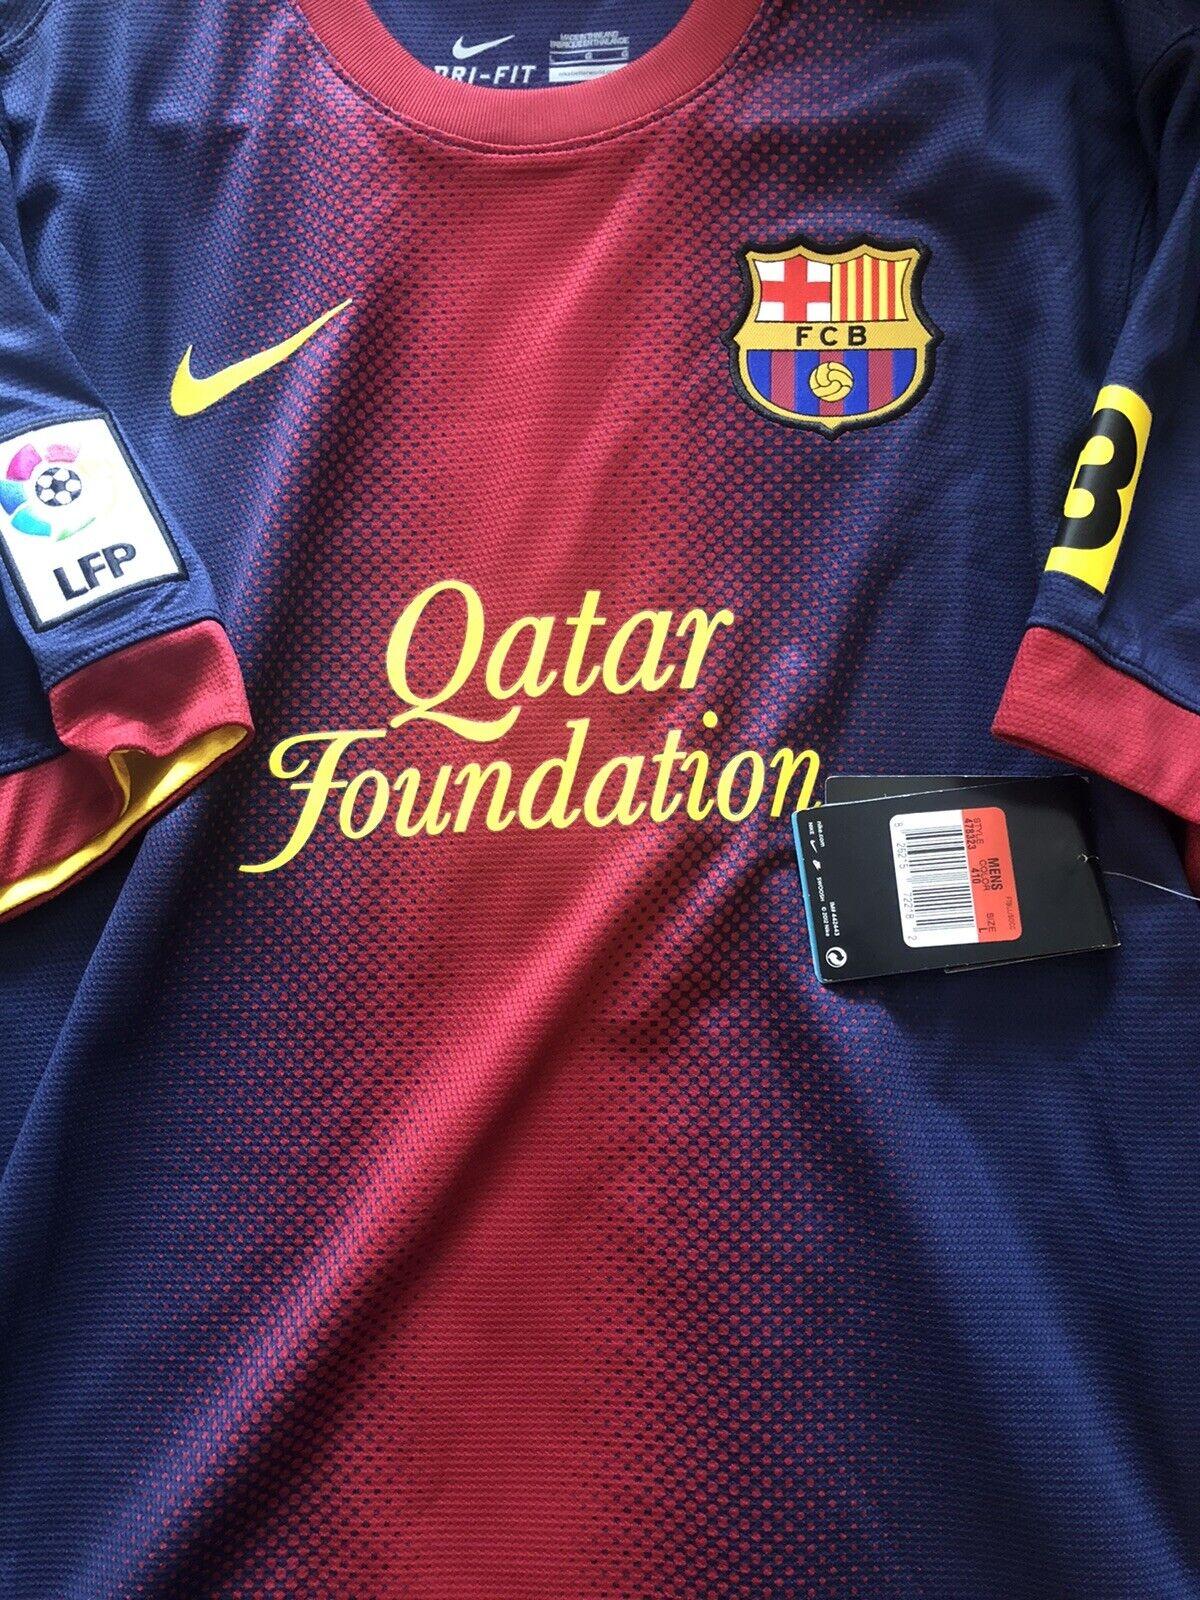 Fc Barcelona Jersey 2012 2013 Home Size L Soccer Nike Football For Sale Online Ebay